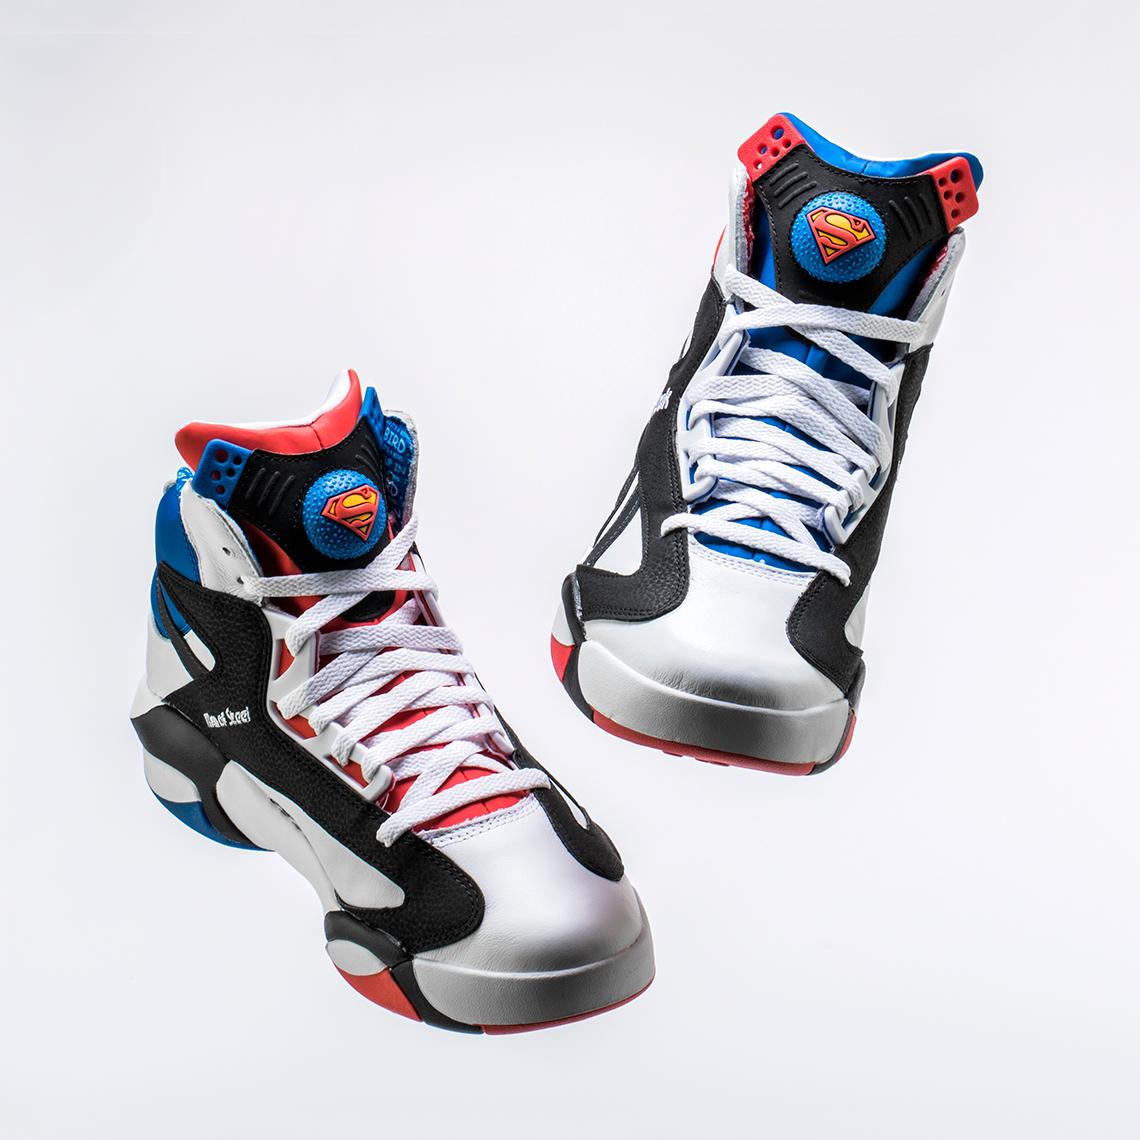 10e02ba96c73 ... purchase shoe palace x reebok shaq attaq release date february 16 2018.  style code cn5728